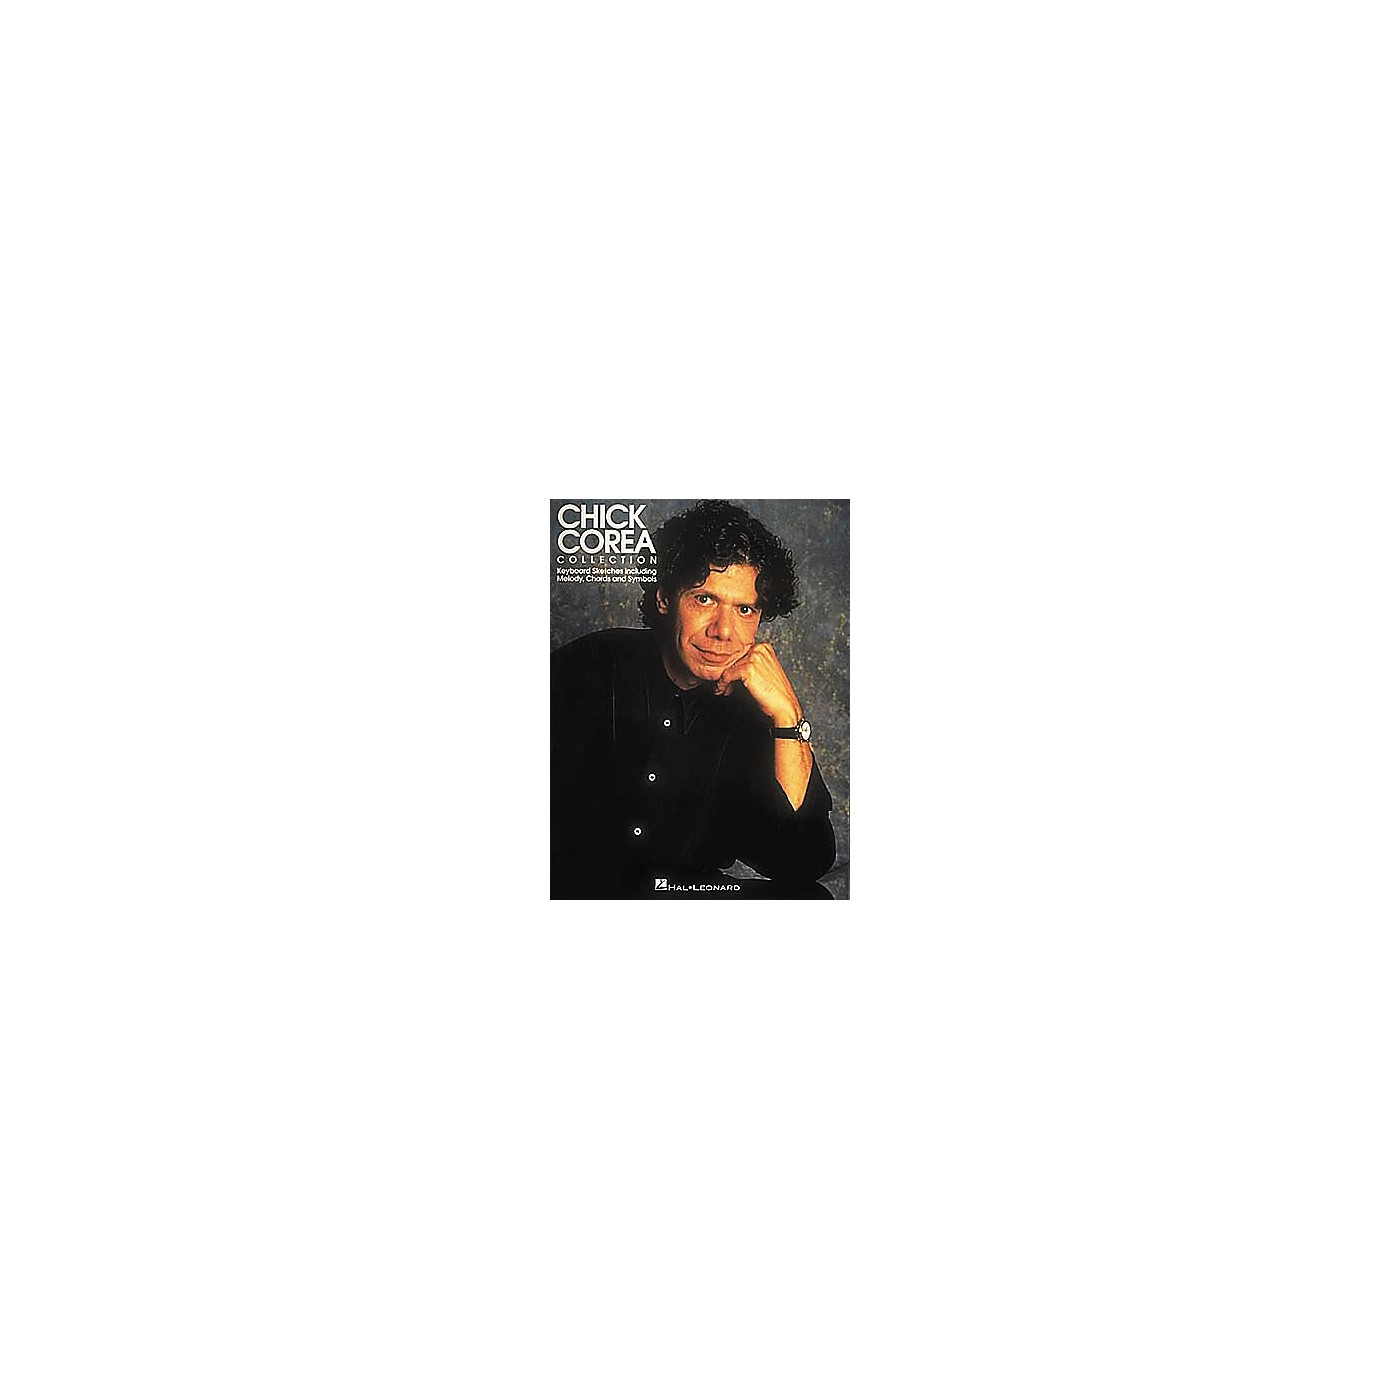 Hal Leonard Chick Corea Collection Piano Book thumbnail